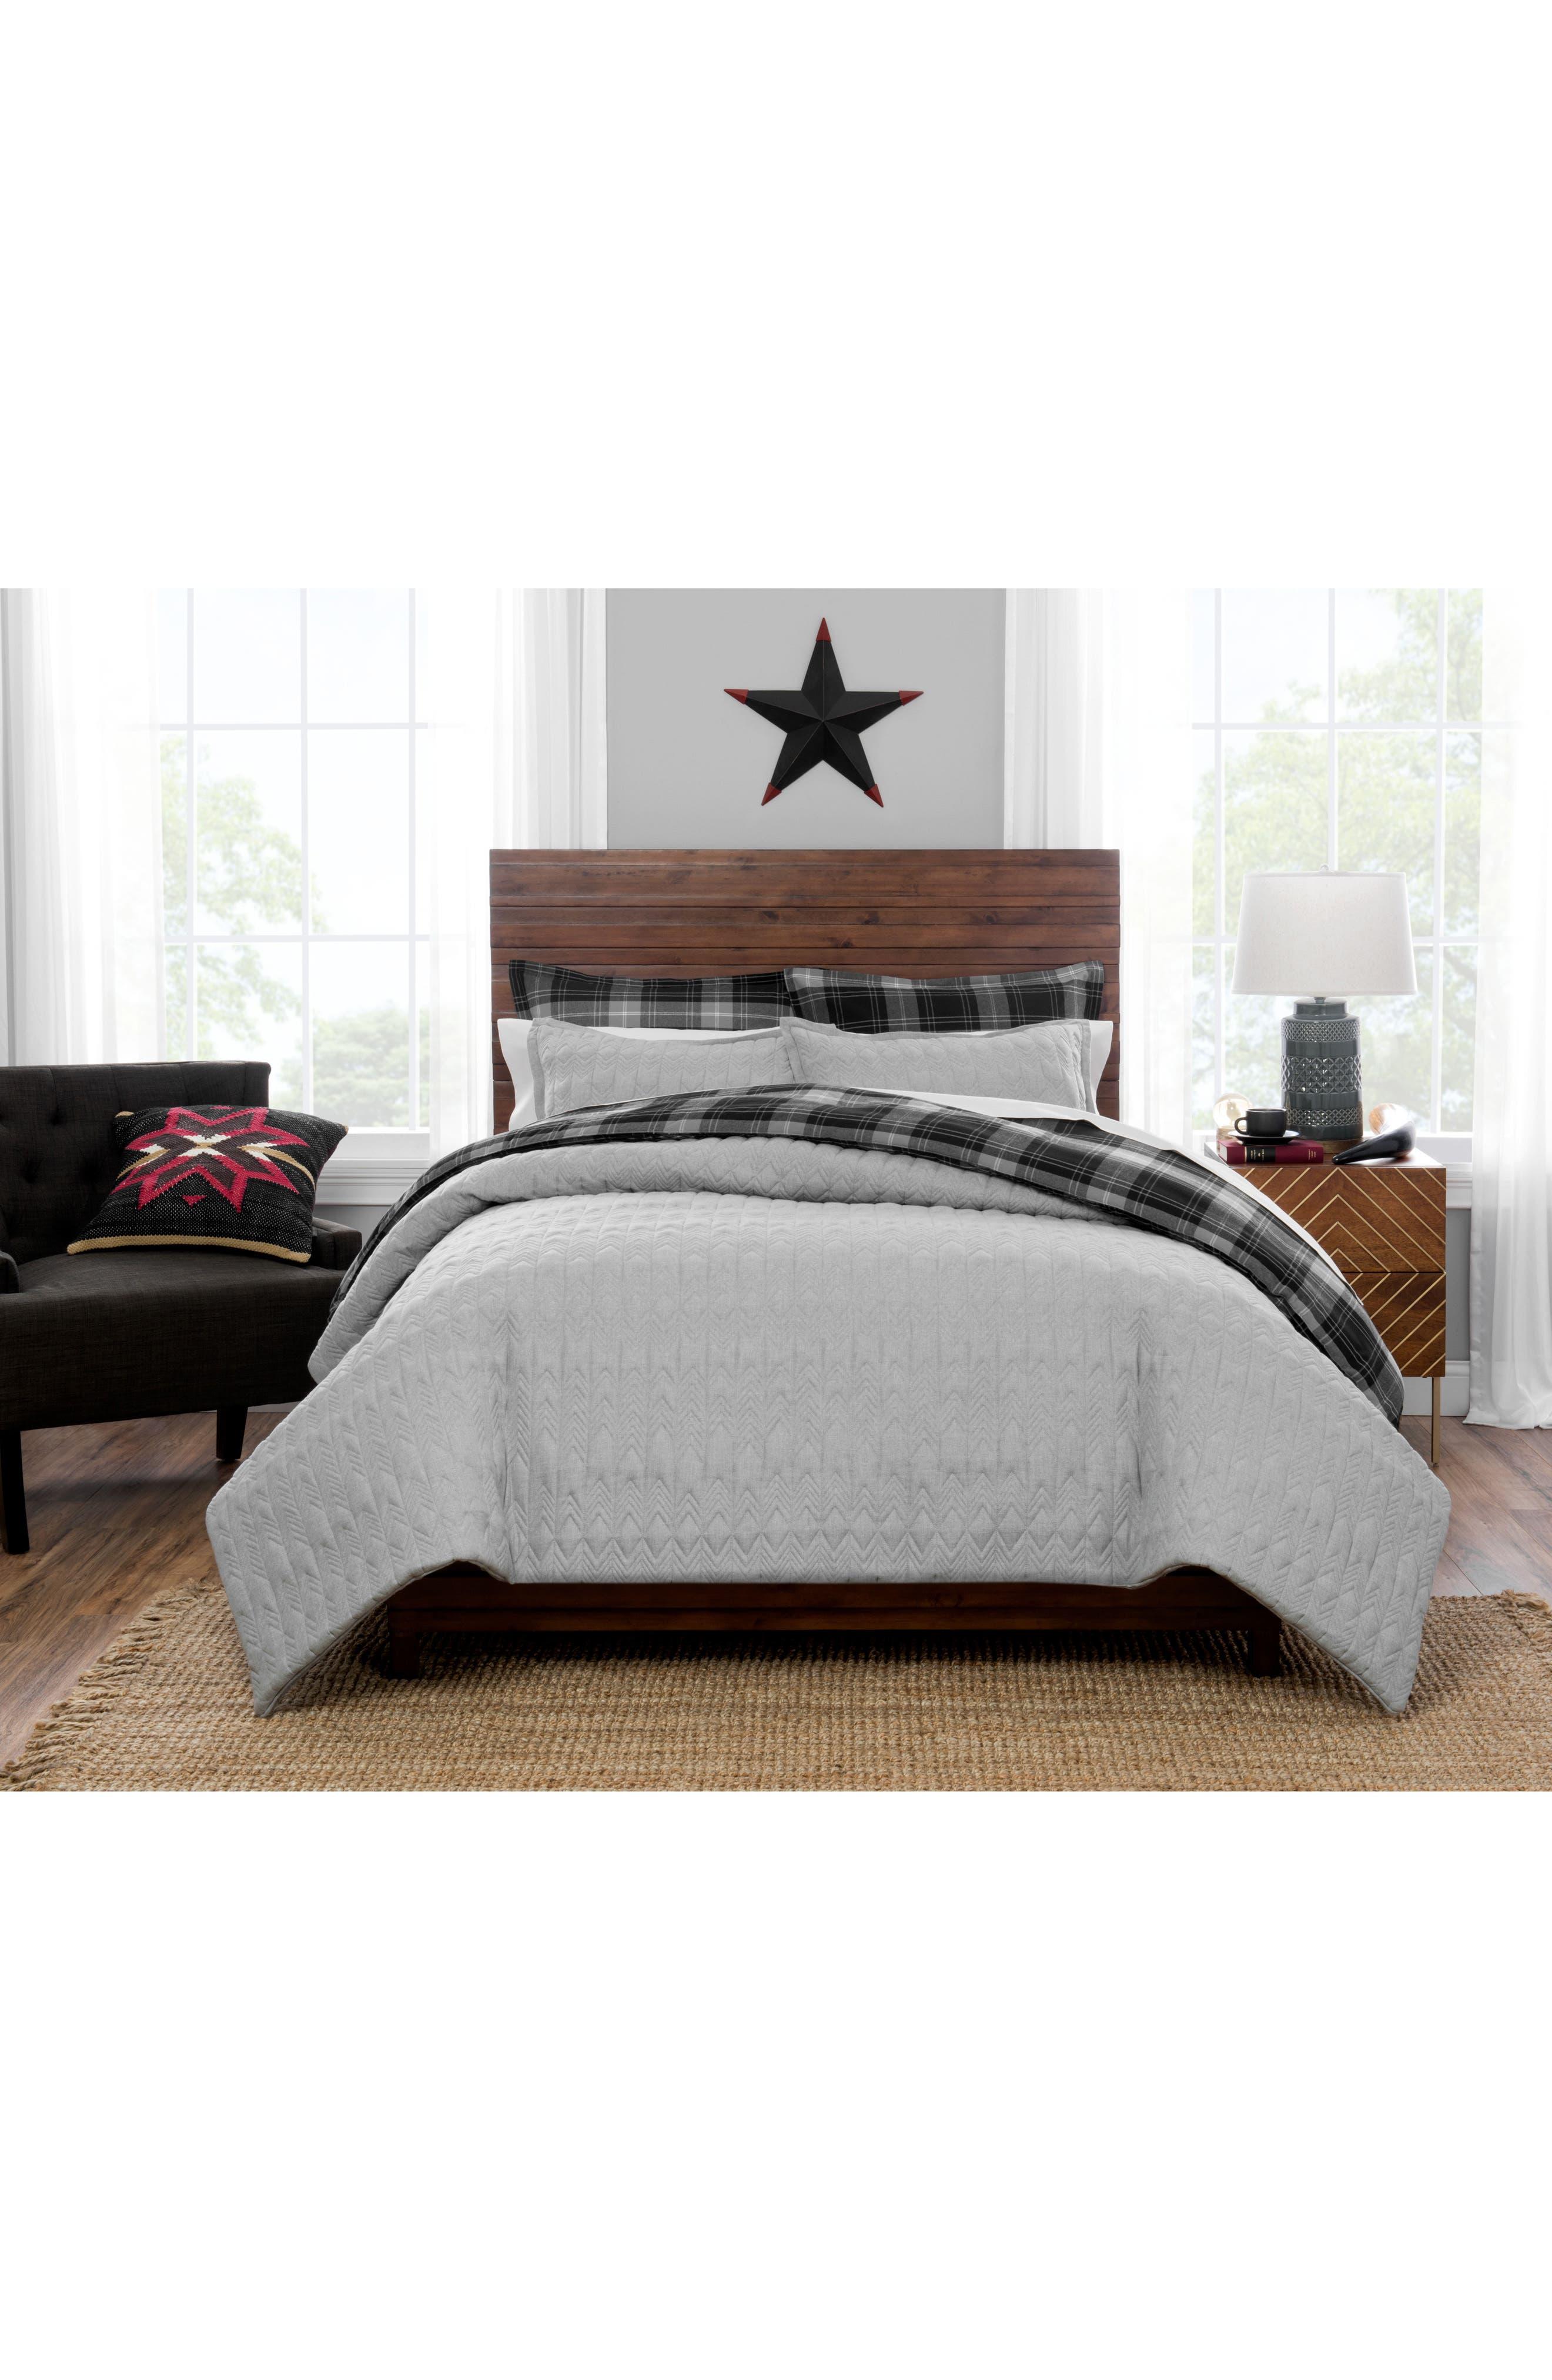 Pendleton Quilted Comforter & Sham Set